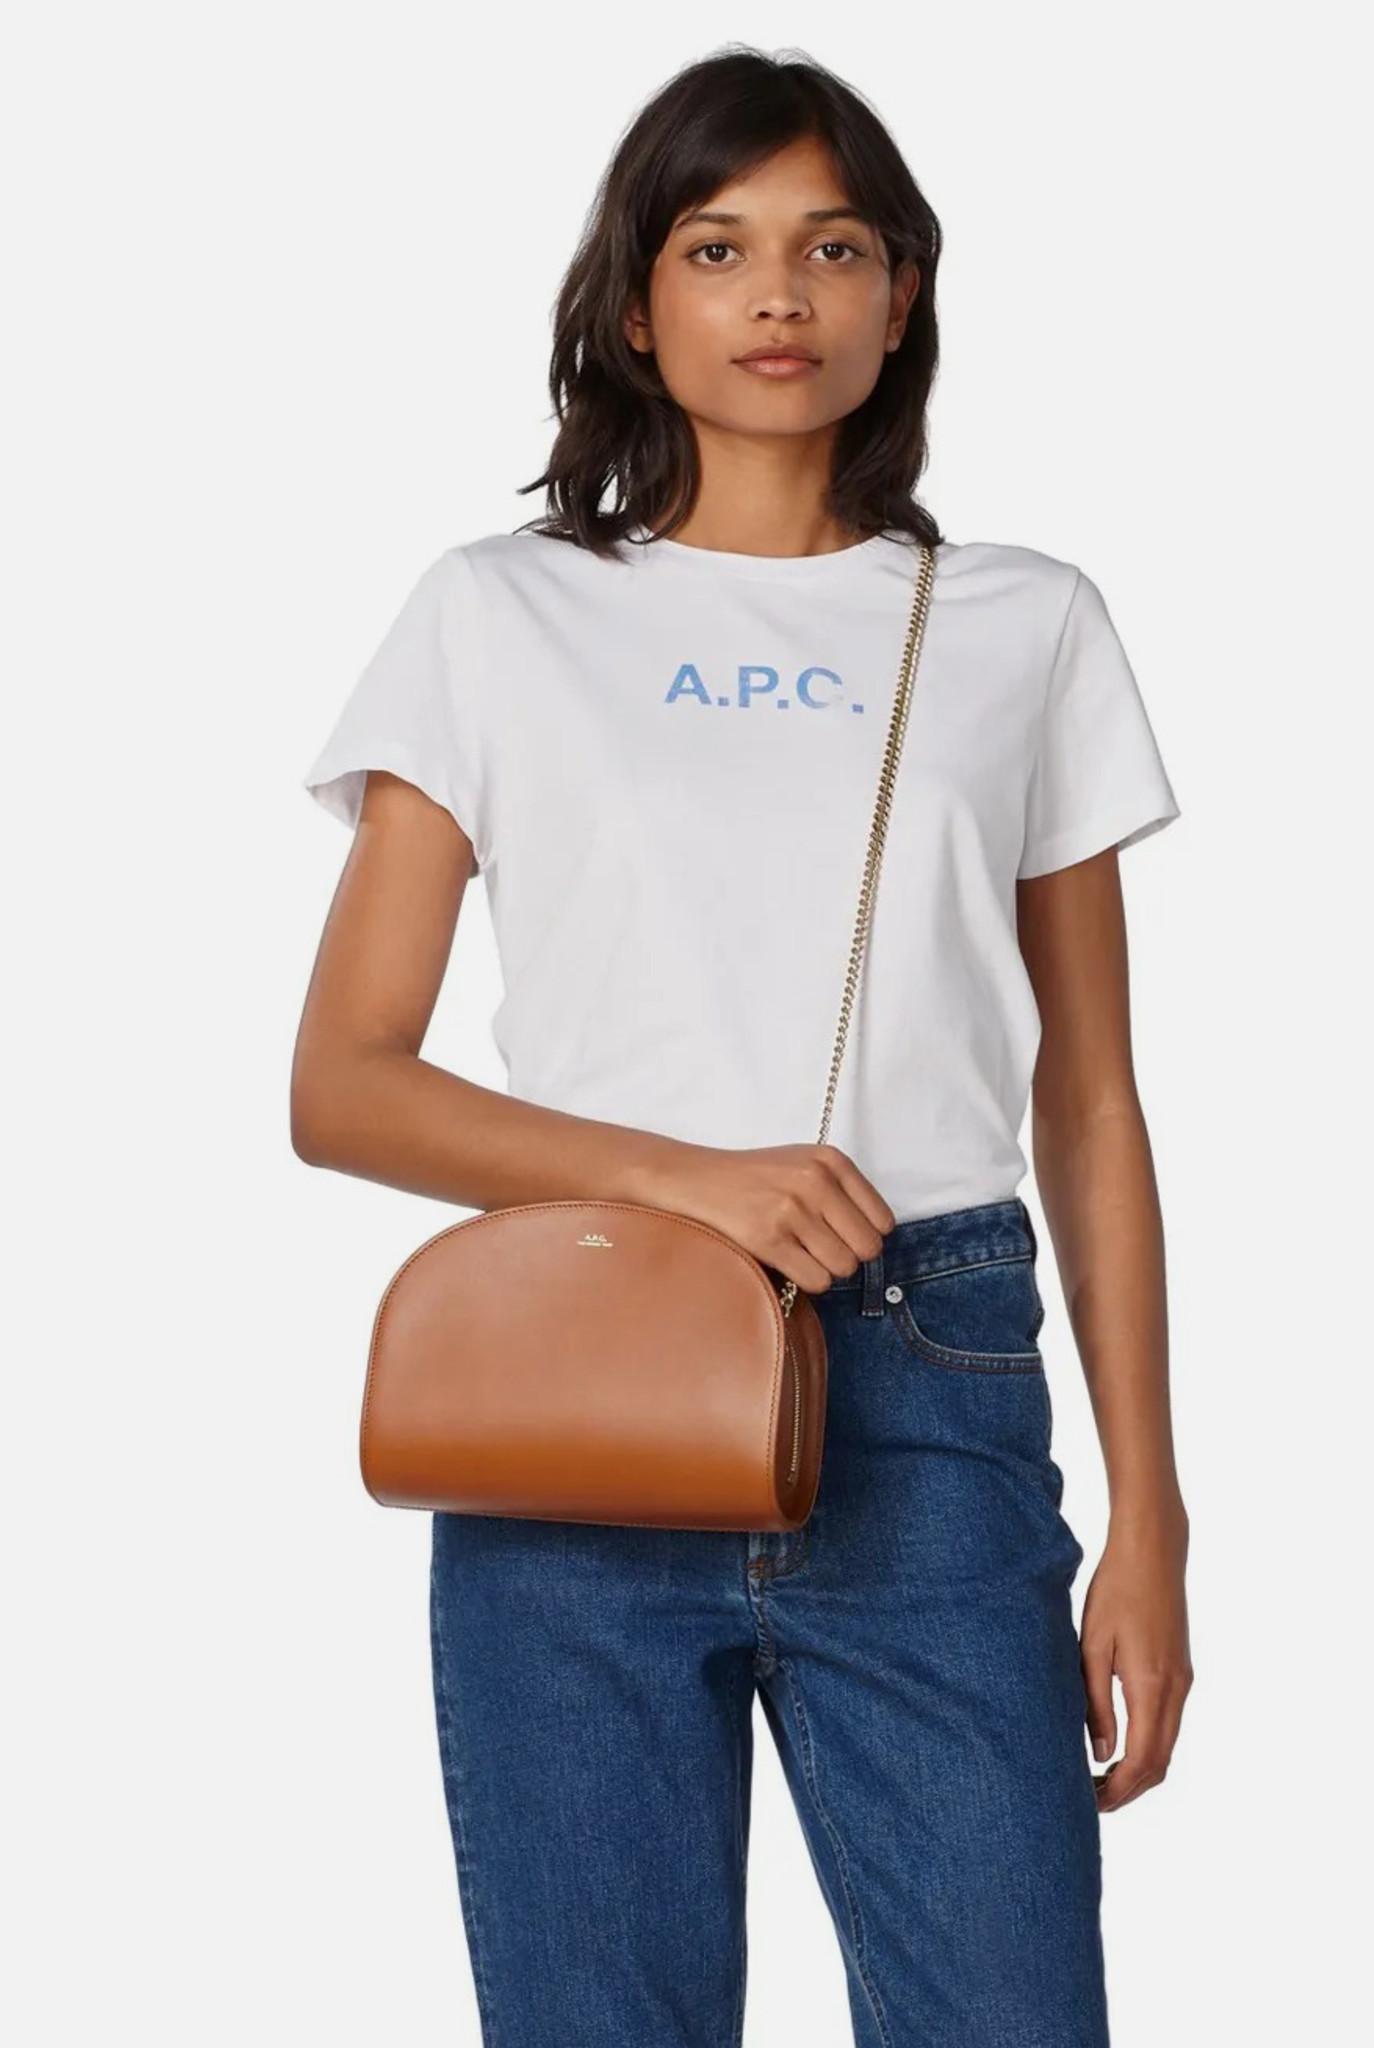 T-shirt Stamp A.P.C. White